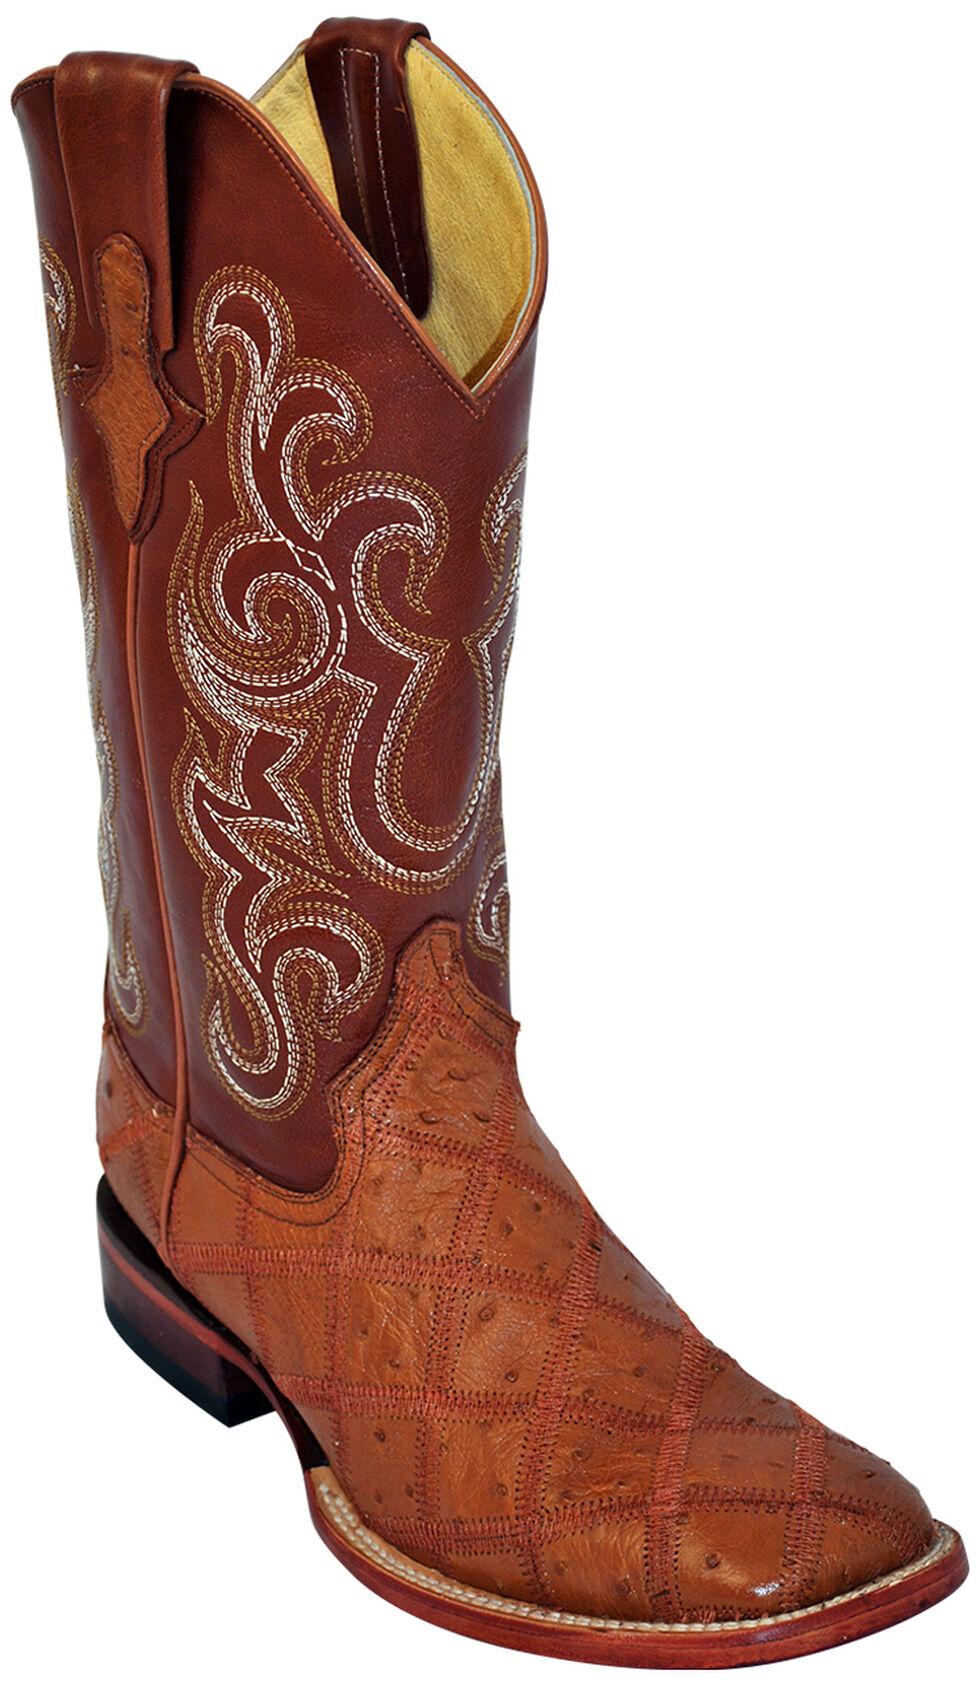 Ferrini Ostrich Patchwork Exotic Western Boots - Square Toe , Cognac, hi-res